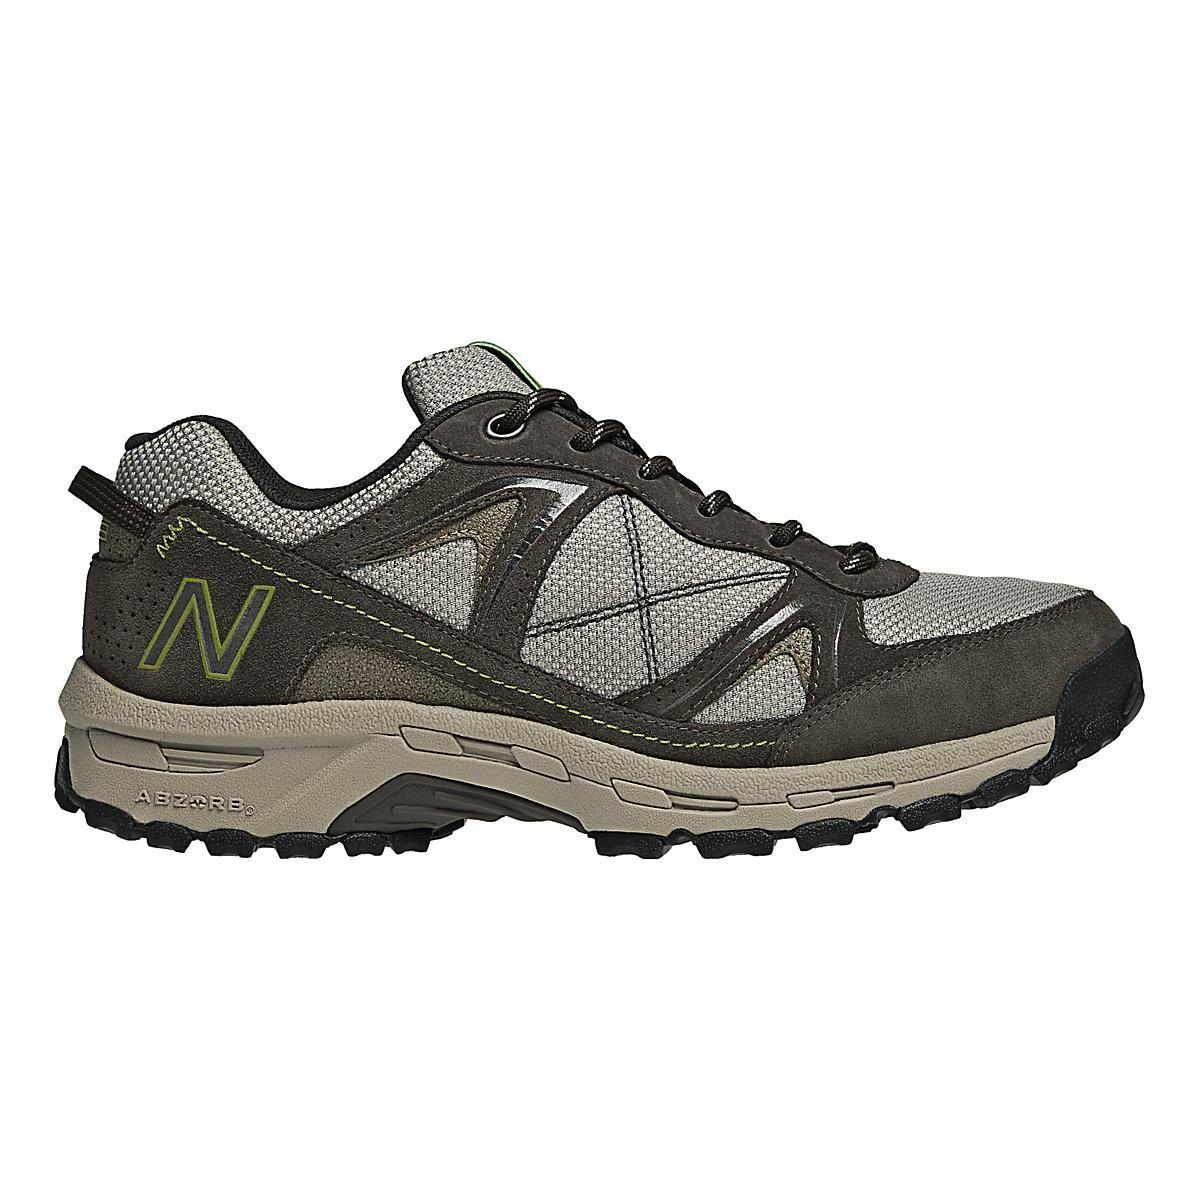 723ecece503a4 Mens New Balance 659 Walking Shoe at Road Runner Sports